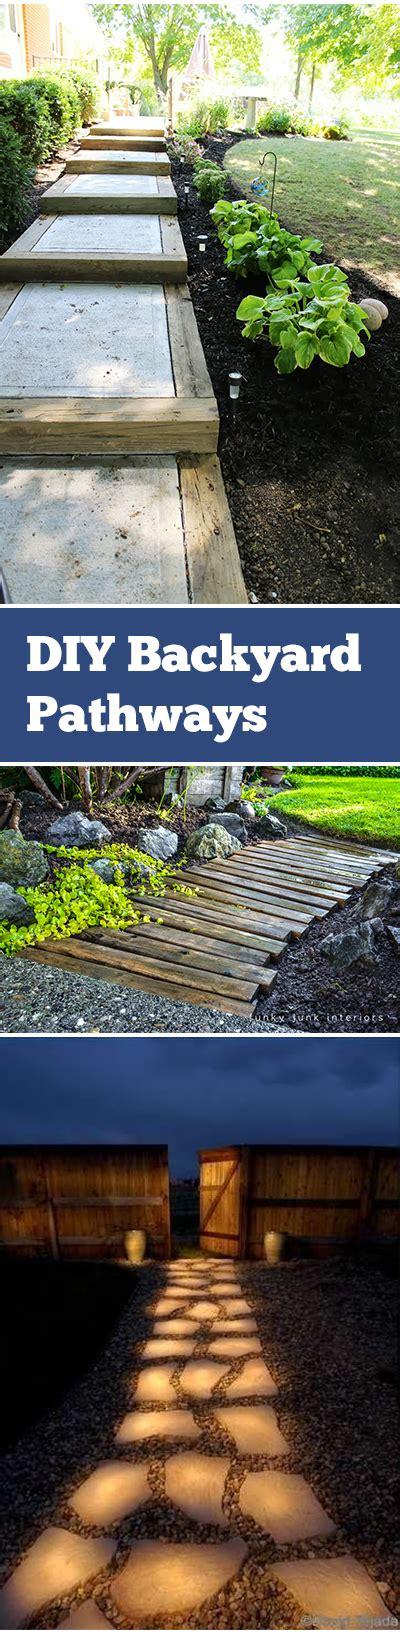 backyard pathways diy backyard pathways page 6